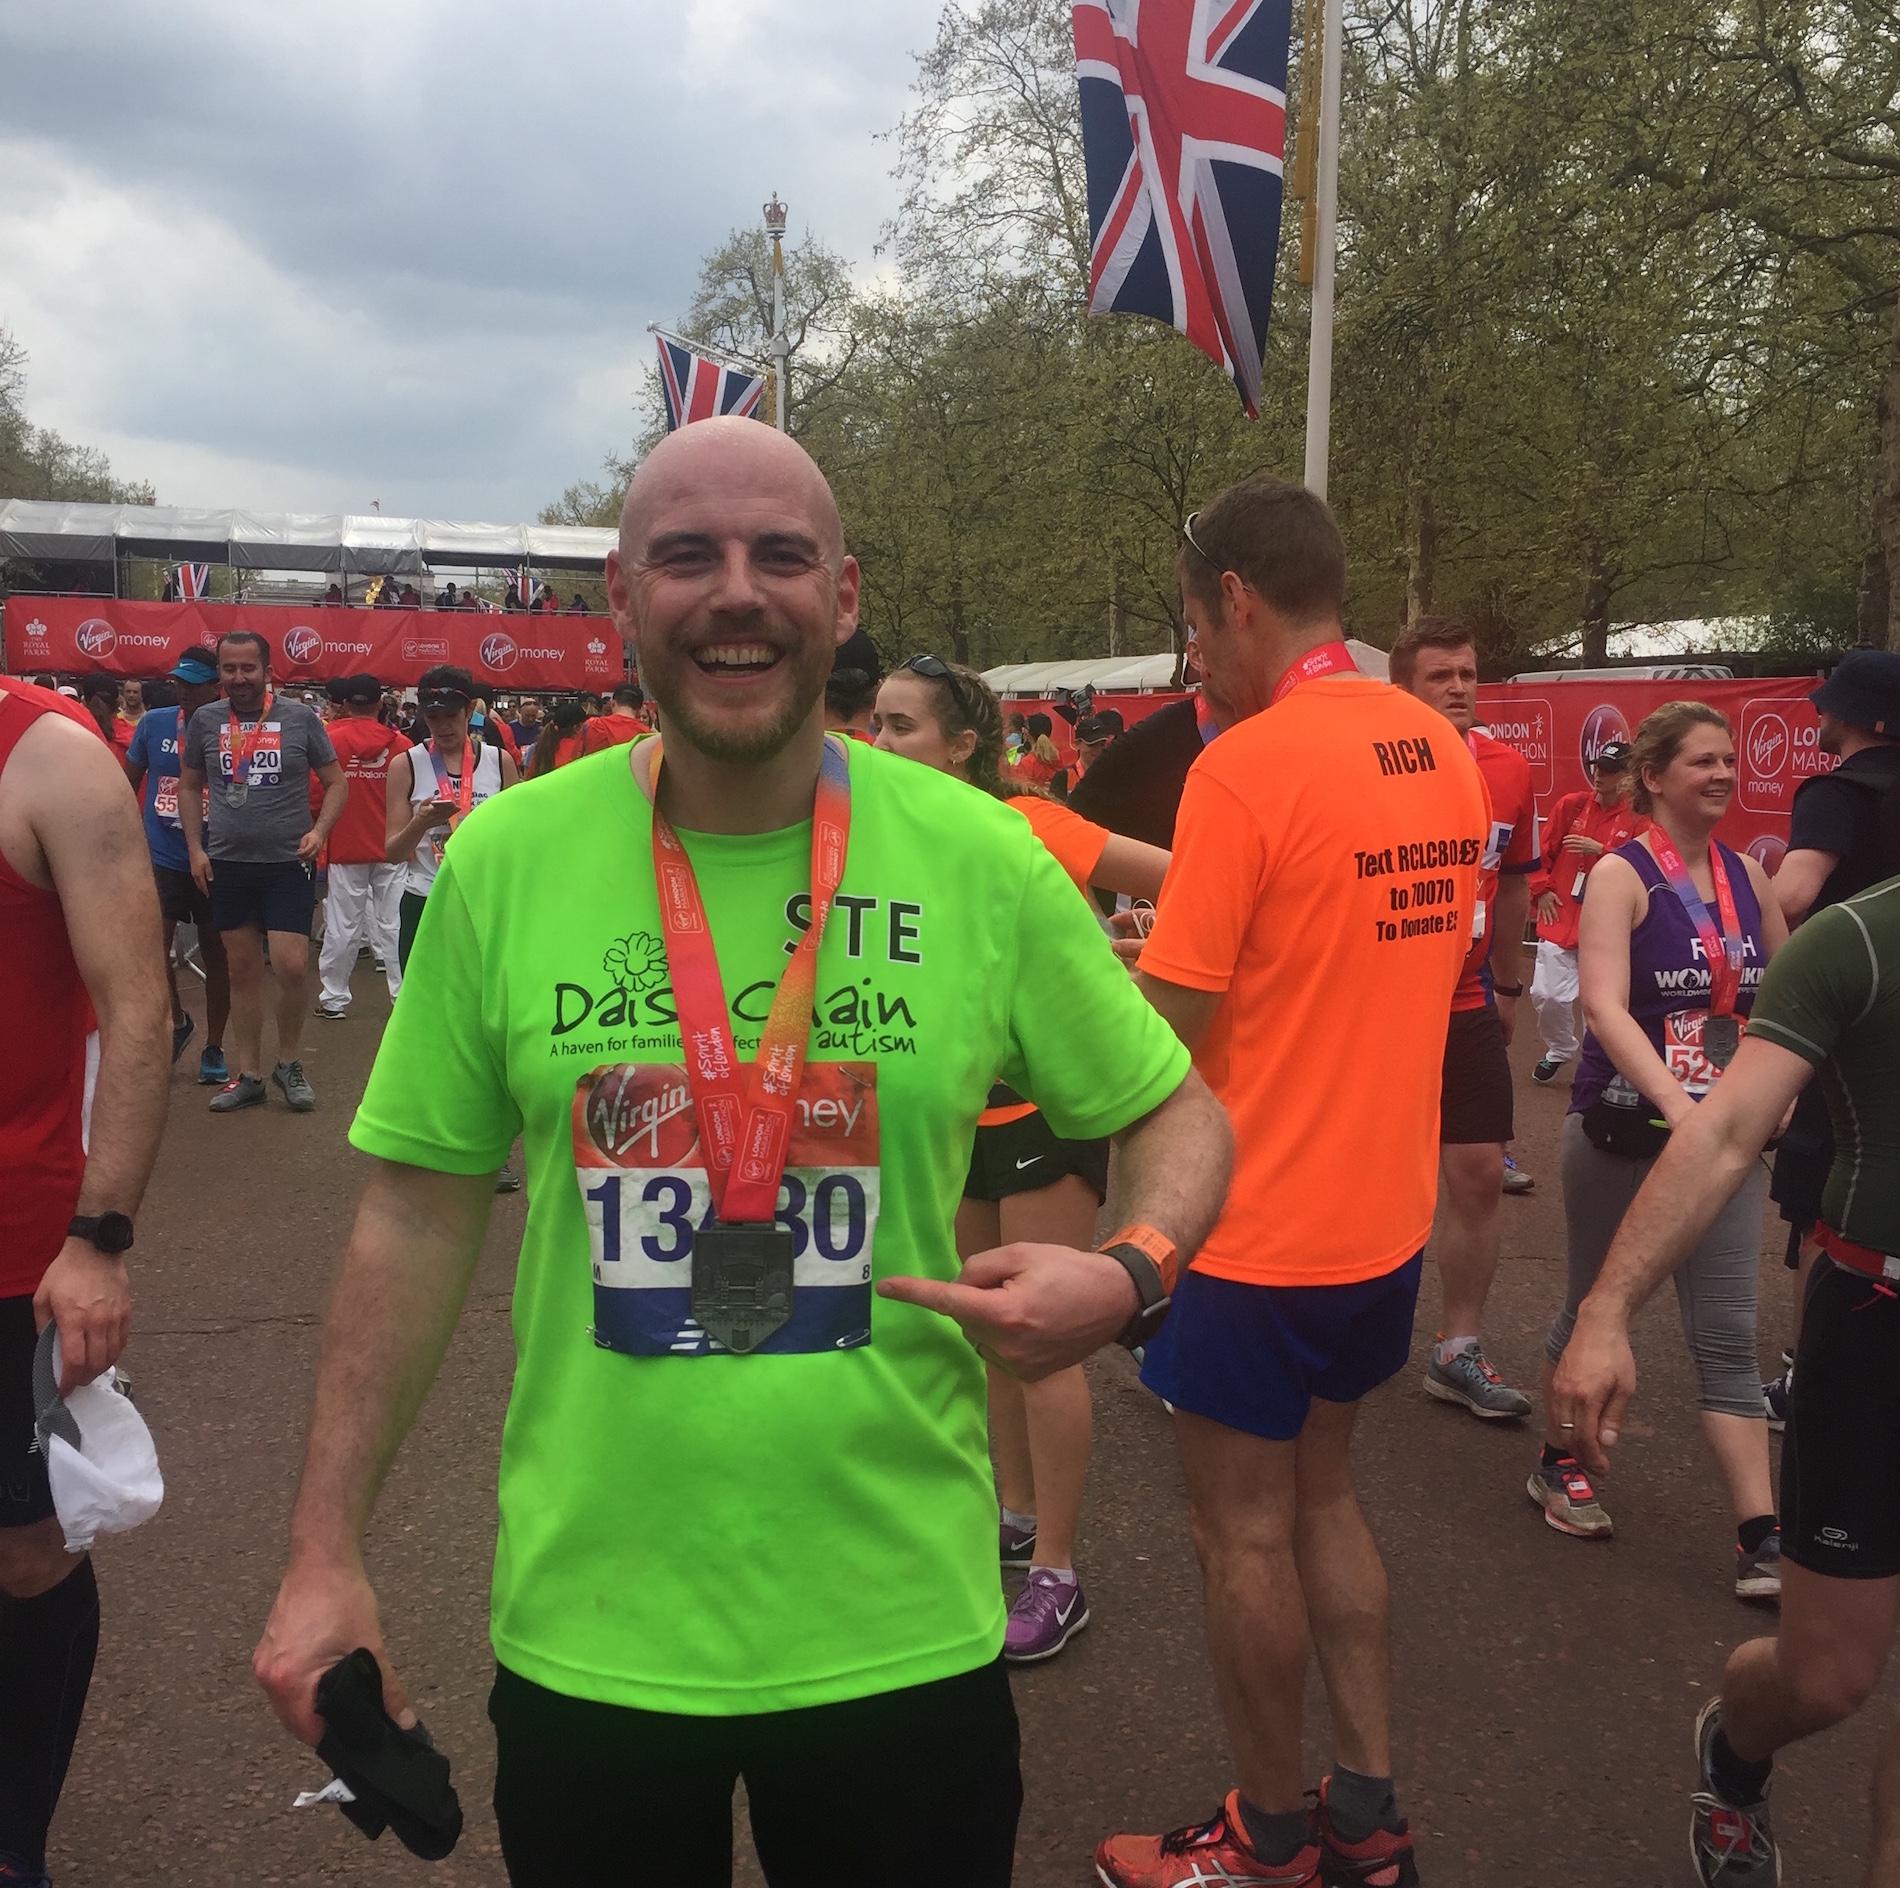 Ste conquers the London Marathon for Daisy Chain